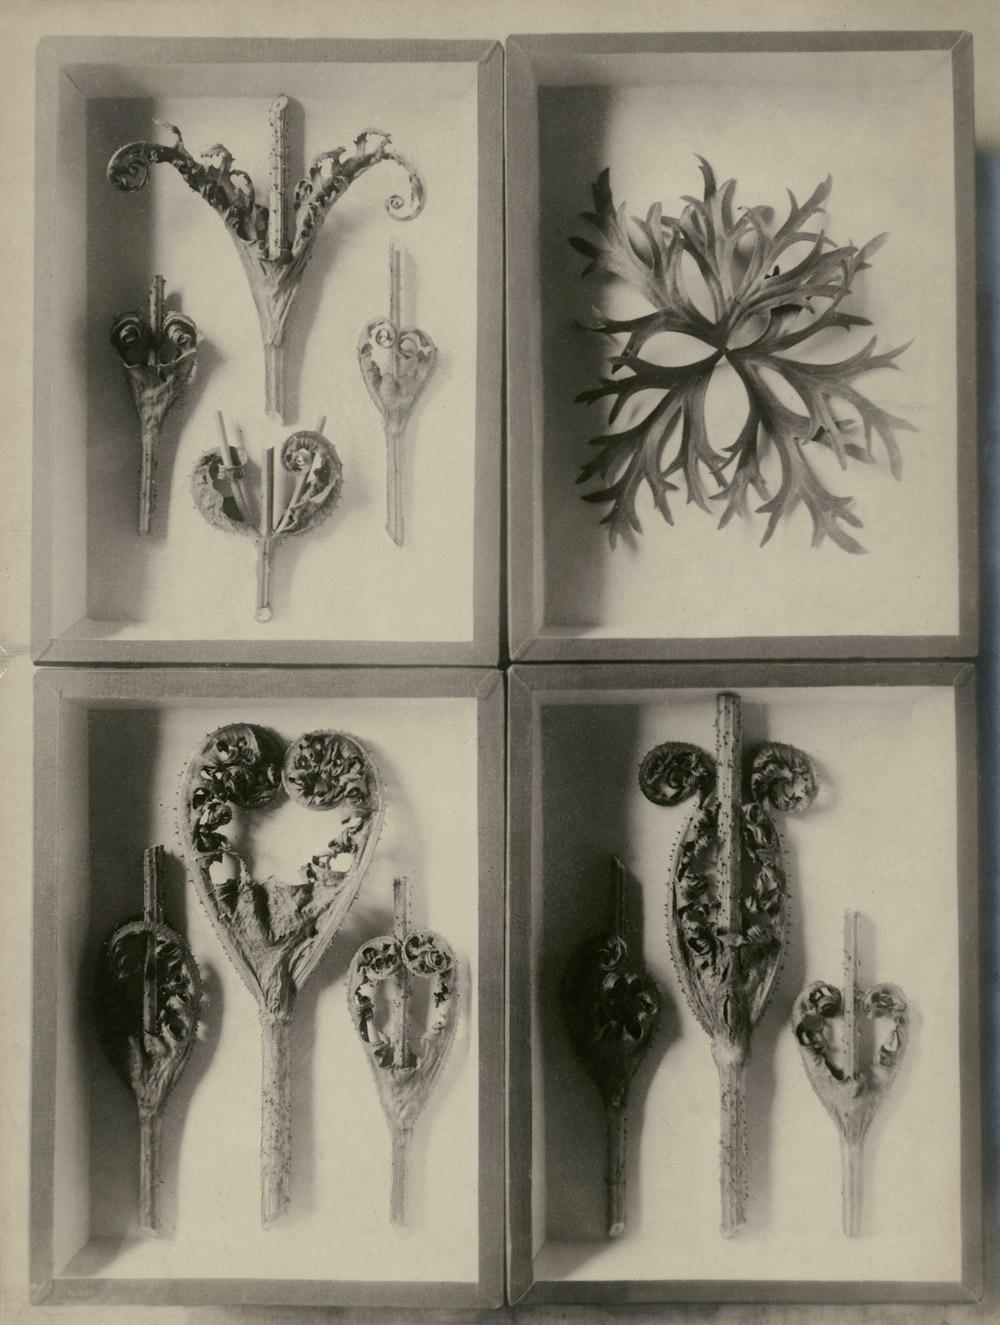 Karl Blossfeldt: Négy növénytanulmány, Dátum nélkül<br />Stiftung Ann und Jürgen Wilde, Pinakothek der Moderne, Munich